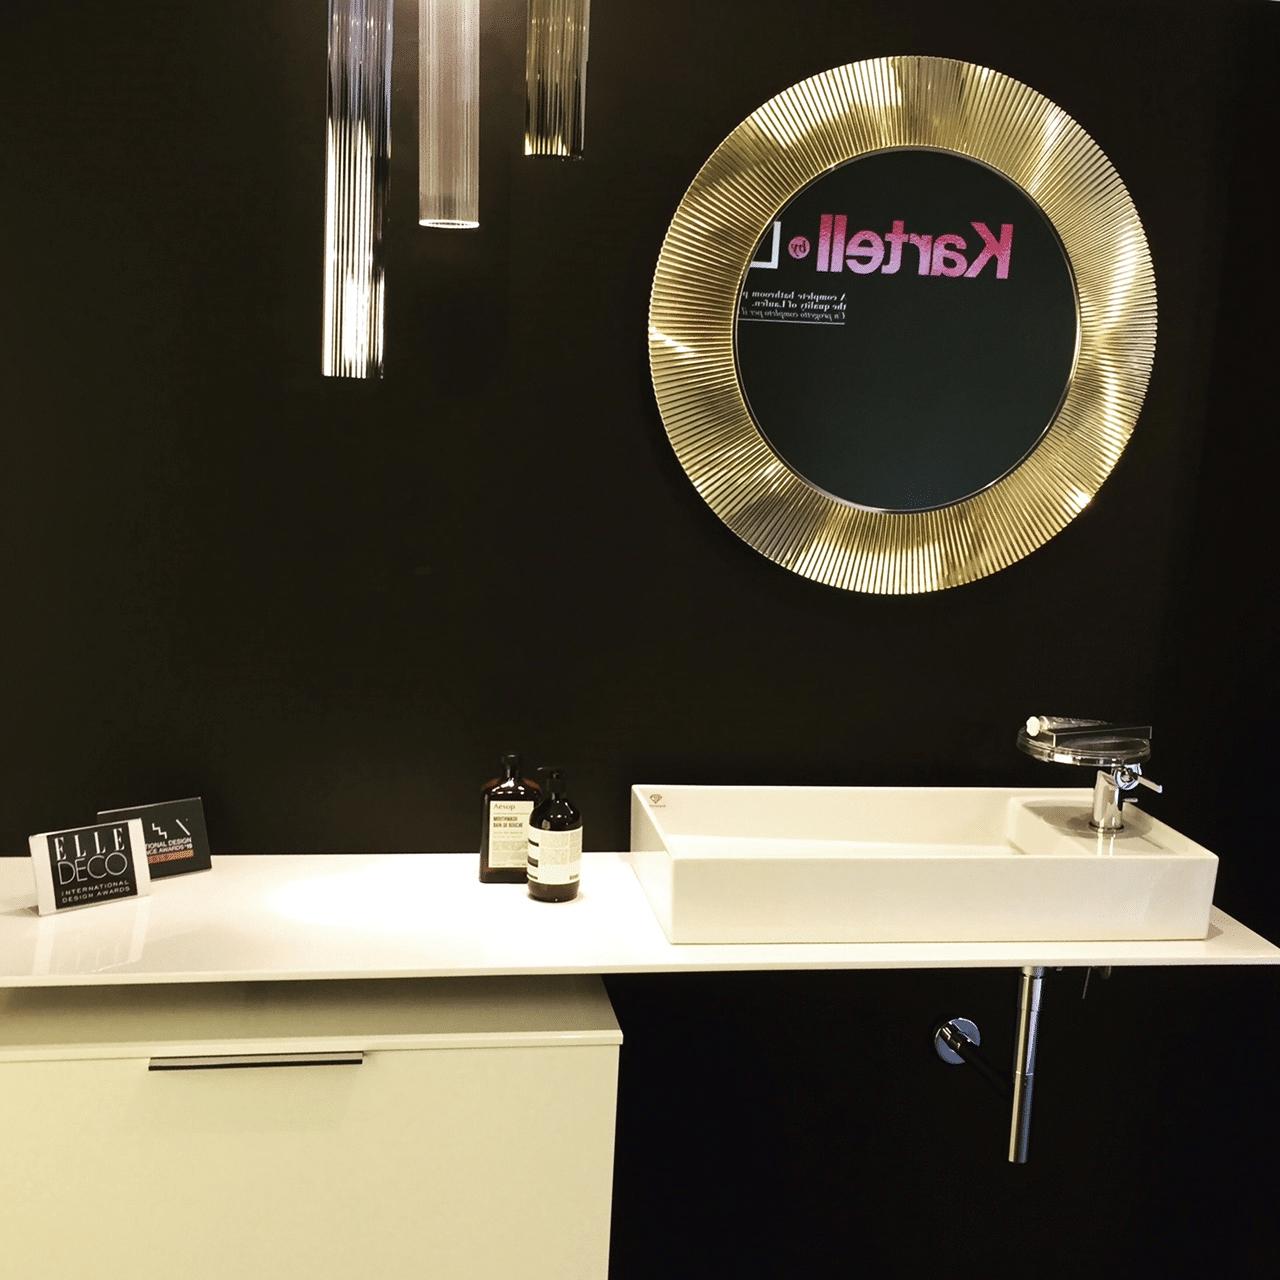 #dehotelpartners #inspiration #saphirkeramik #kartell #hoteldesign #hospitality #innovation #icons @laufenbathrooms